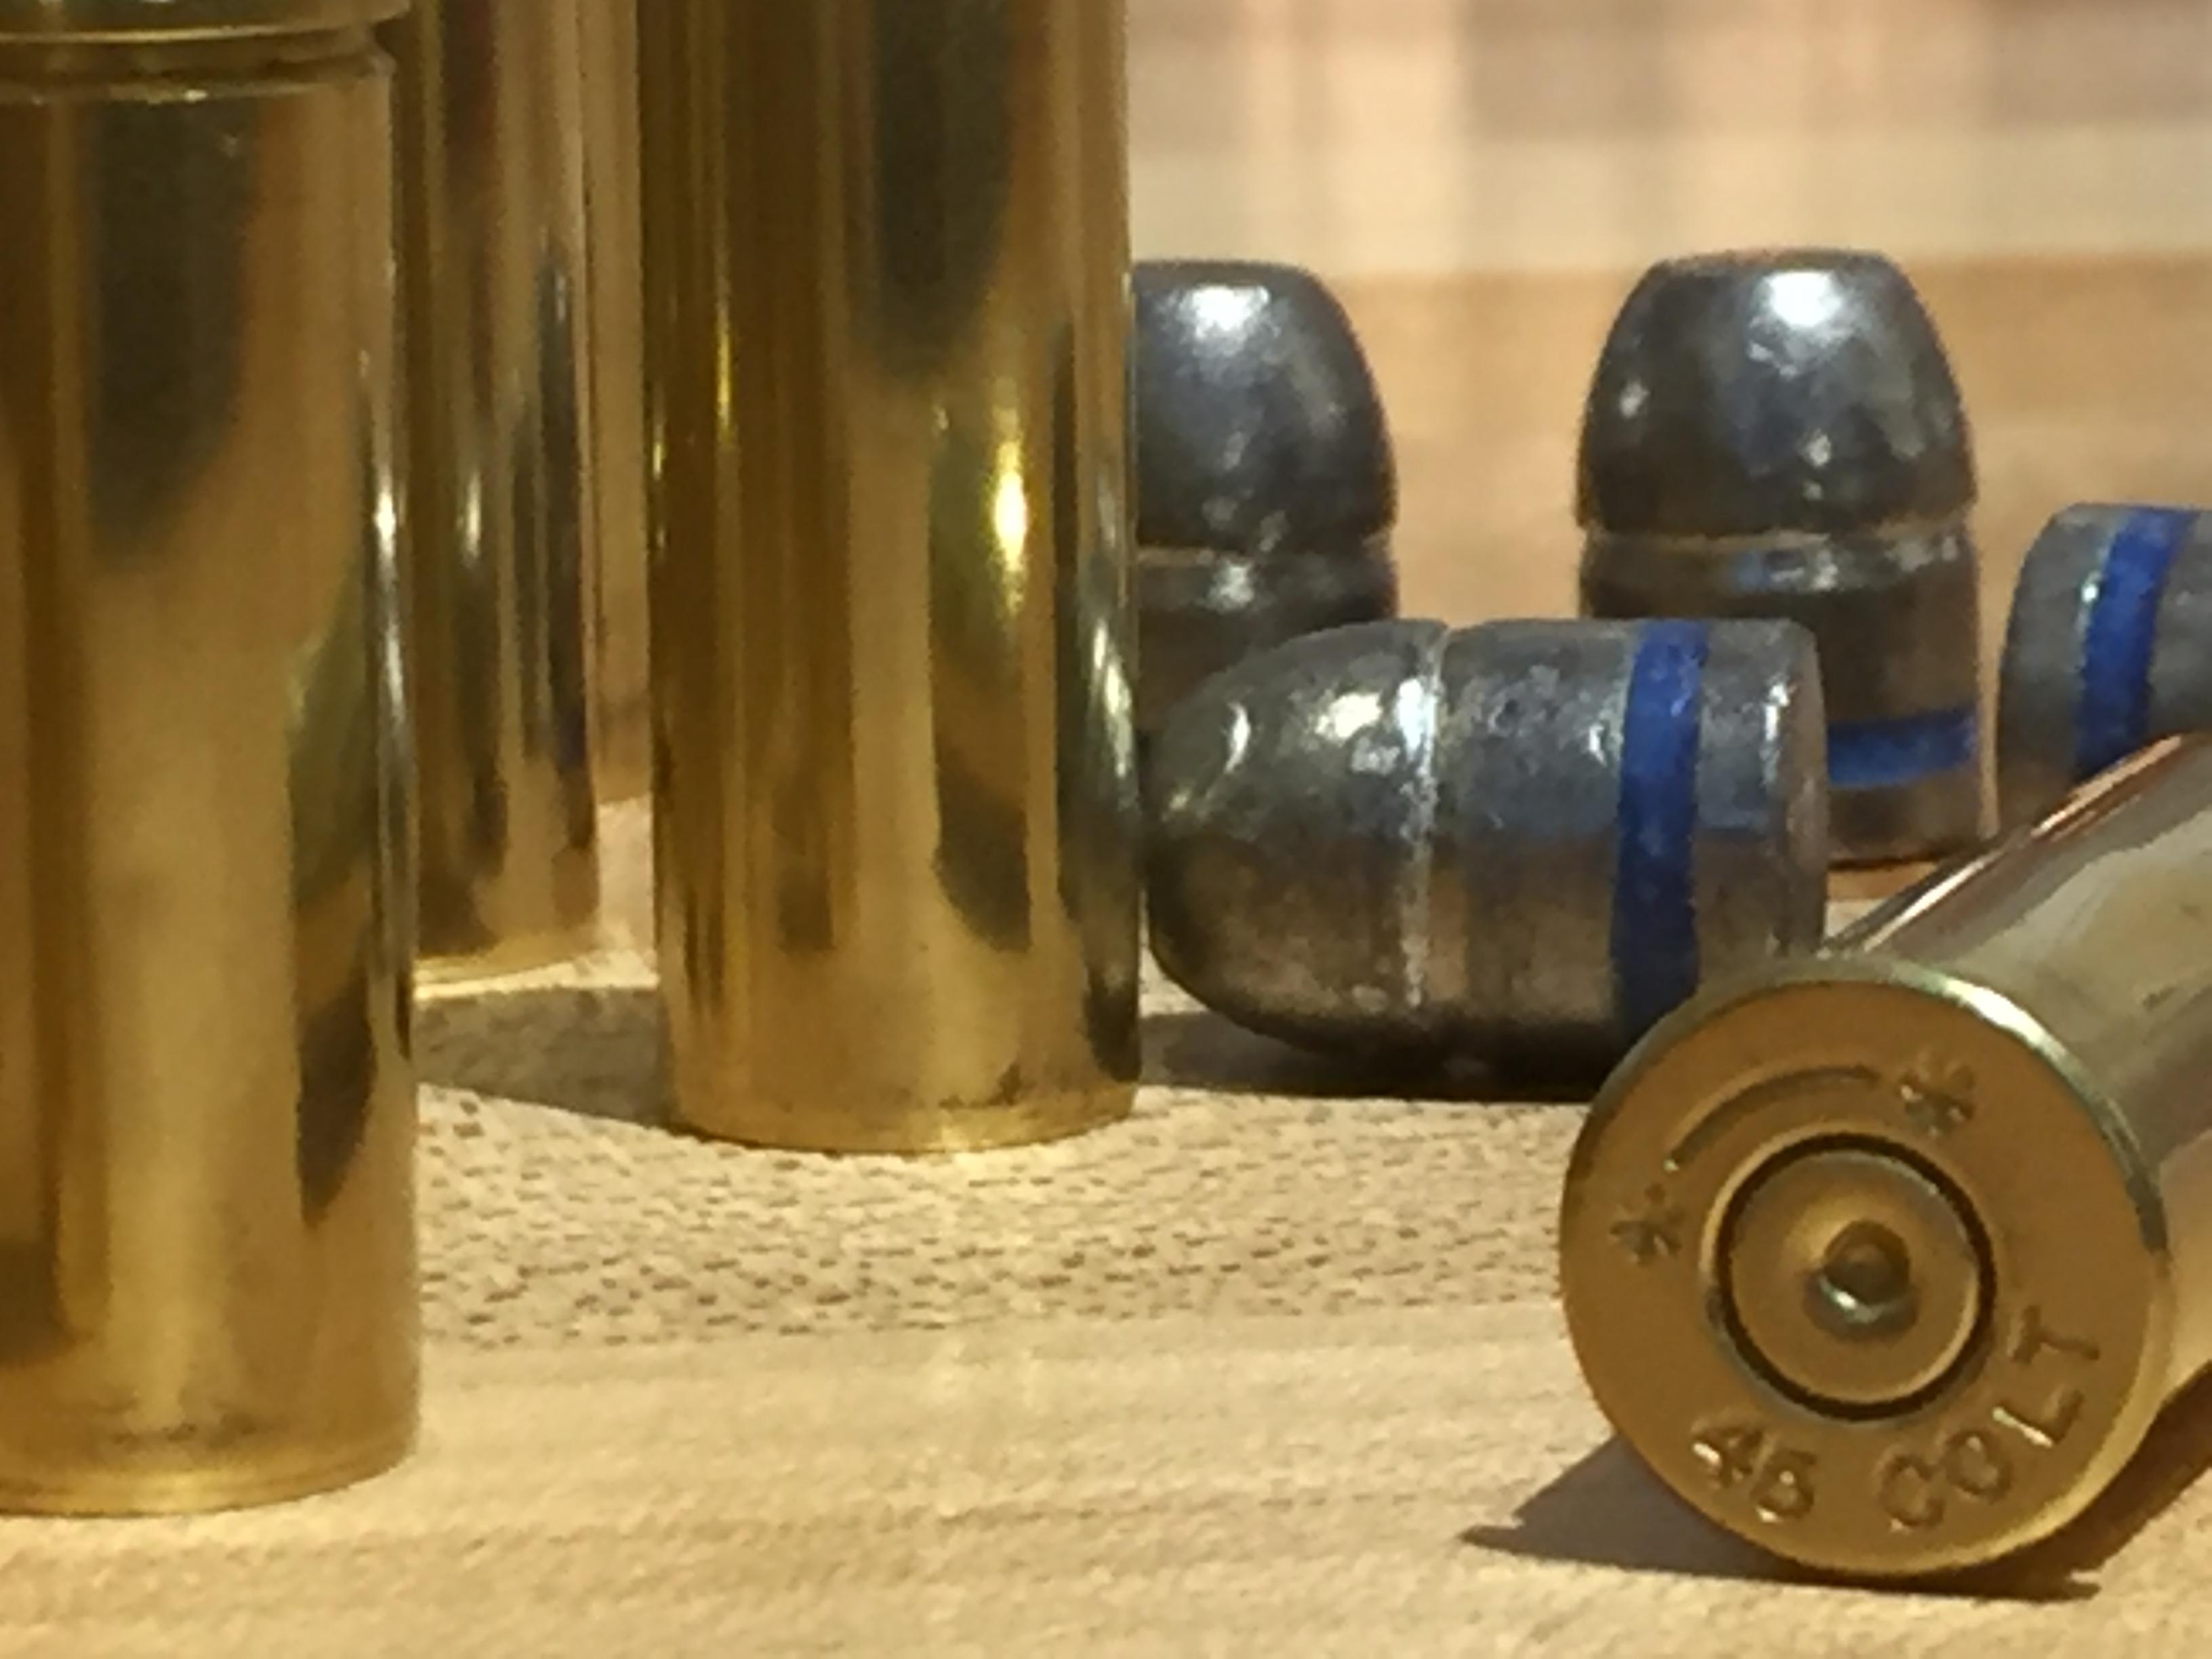 The 45 Colt Cartridge